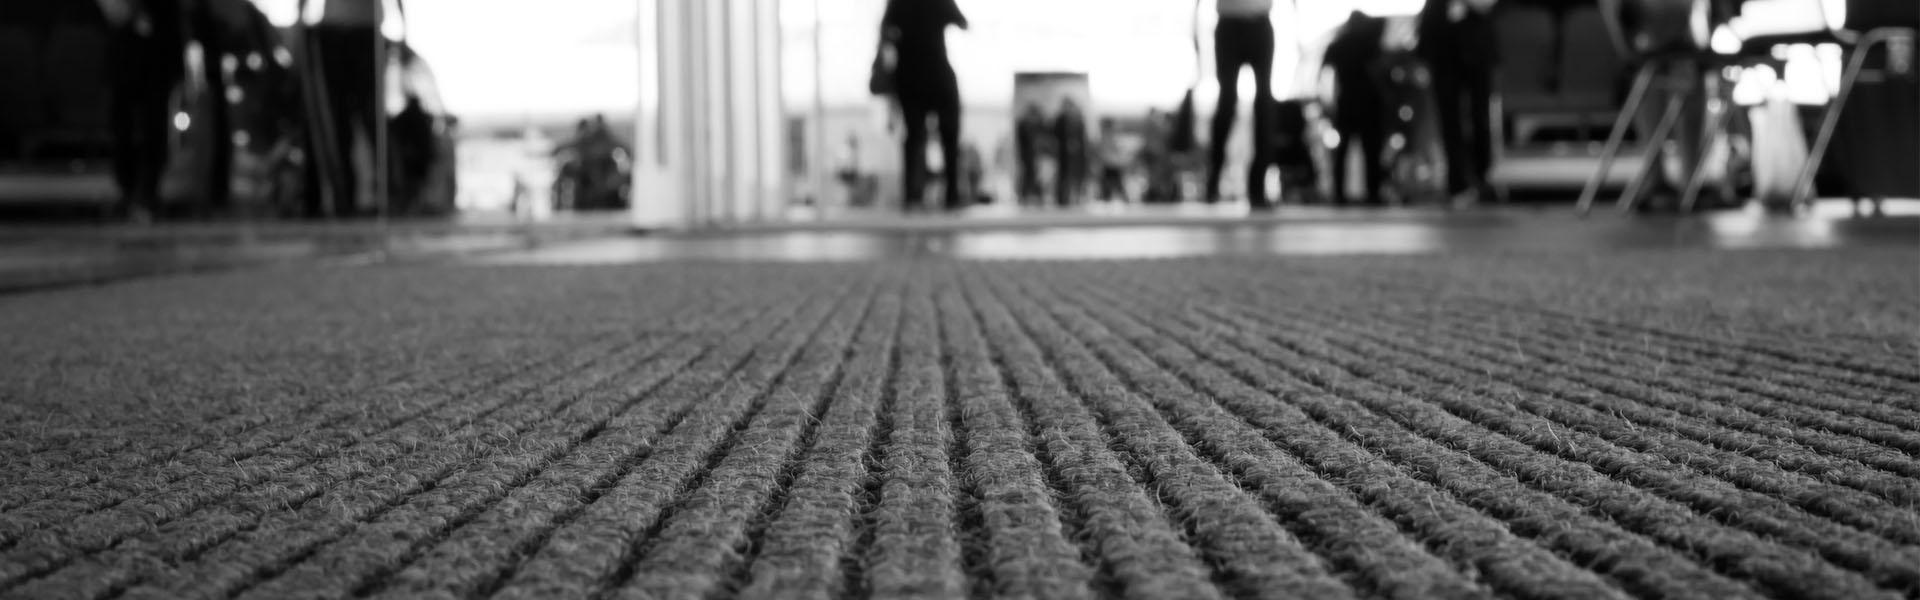 sauberer Teppich